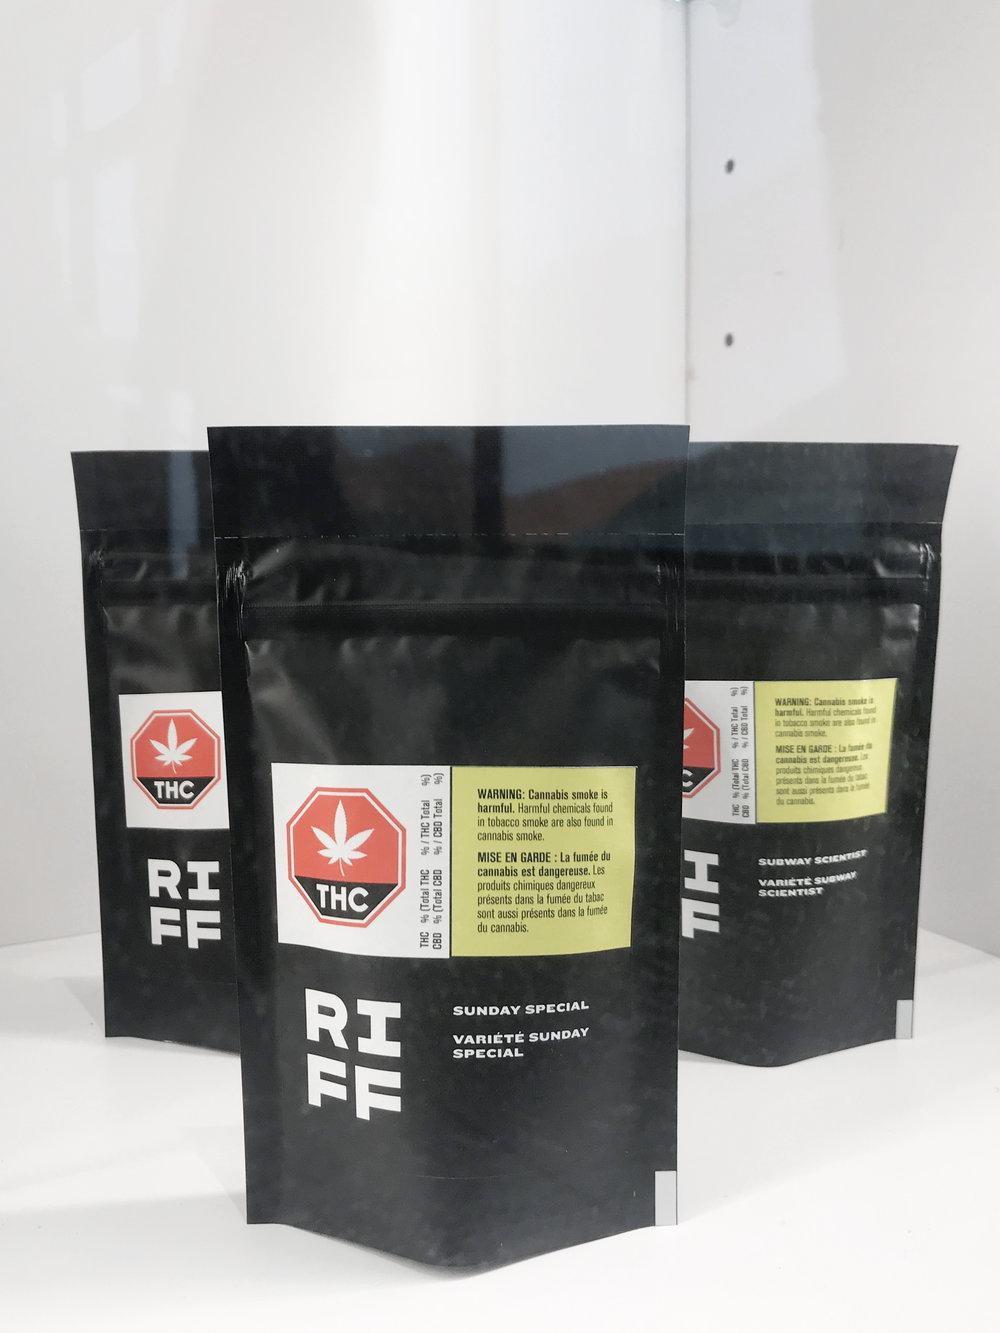 KAESPO Blog Fire and Flower Cannabis Edmonton 015.jpg